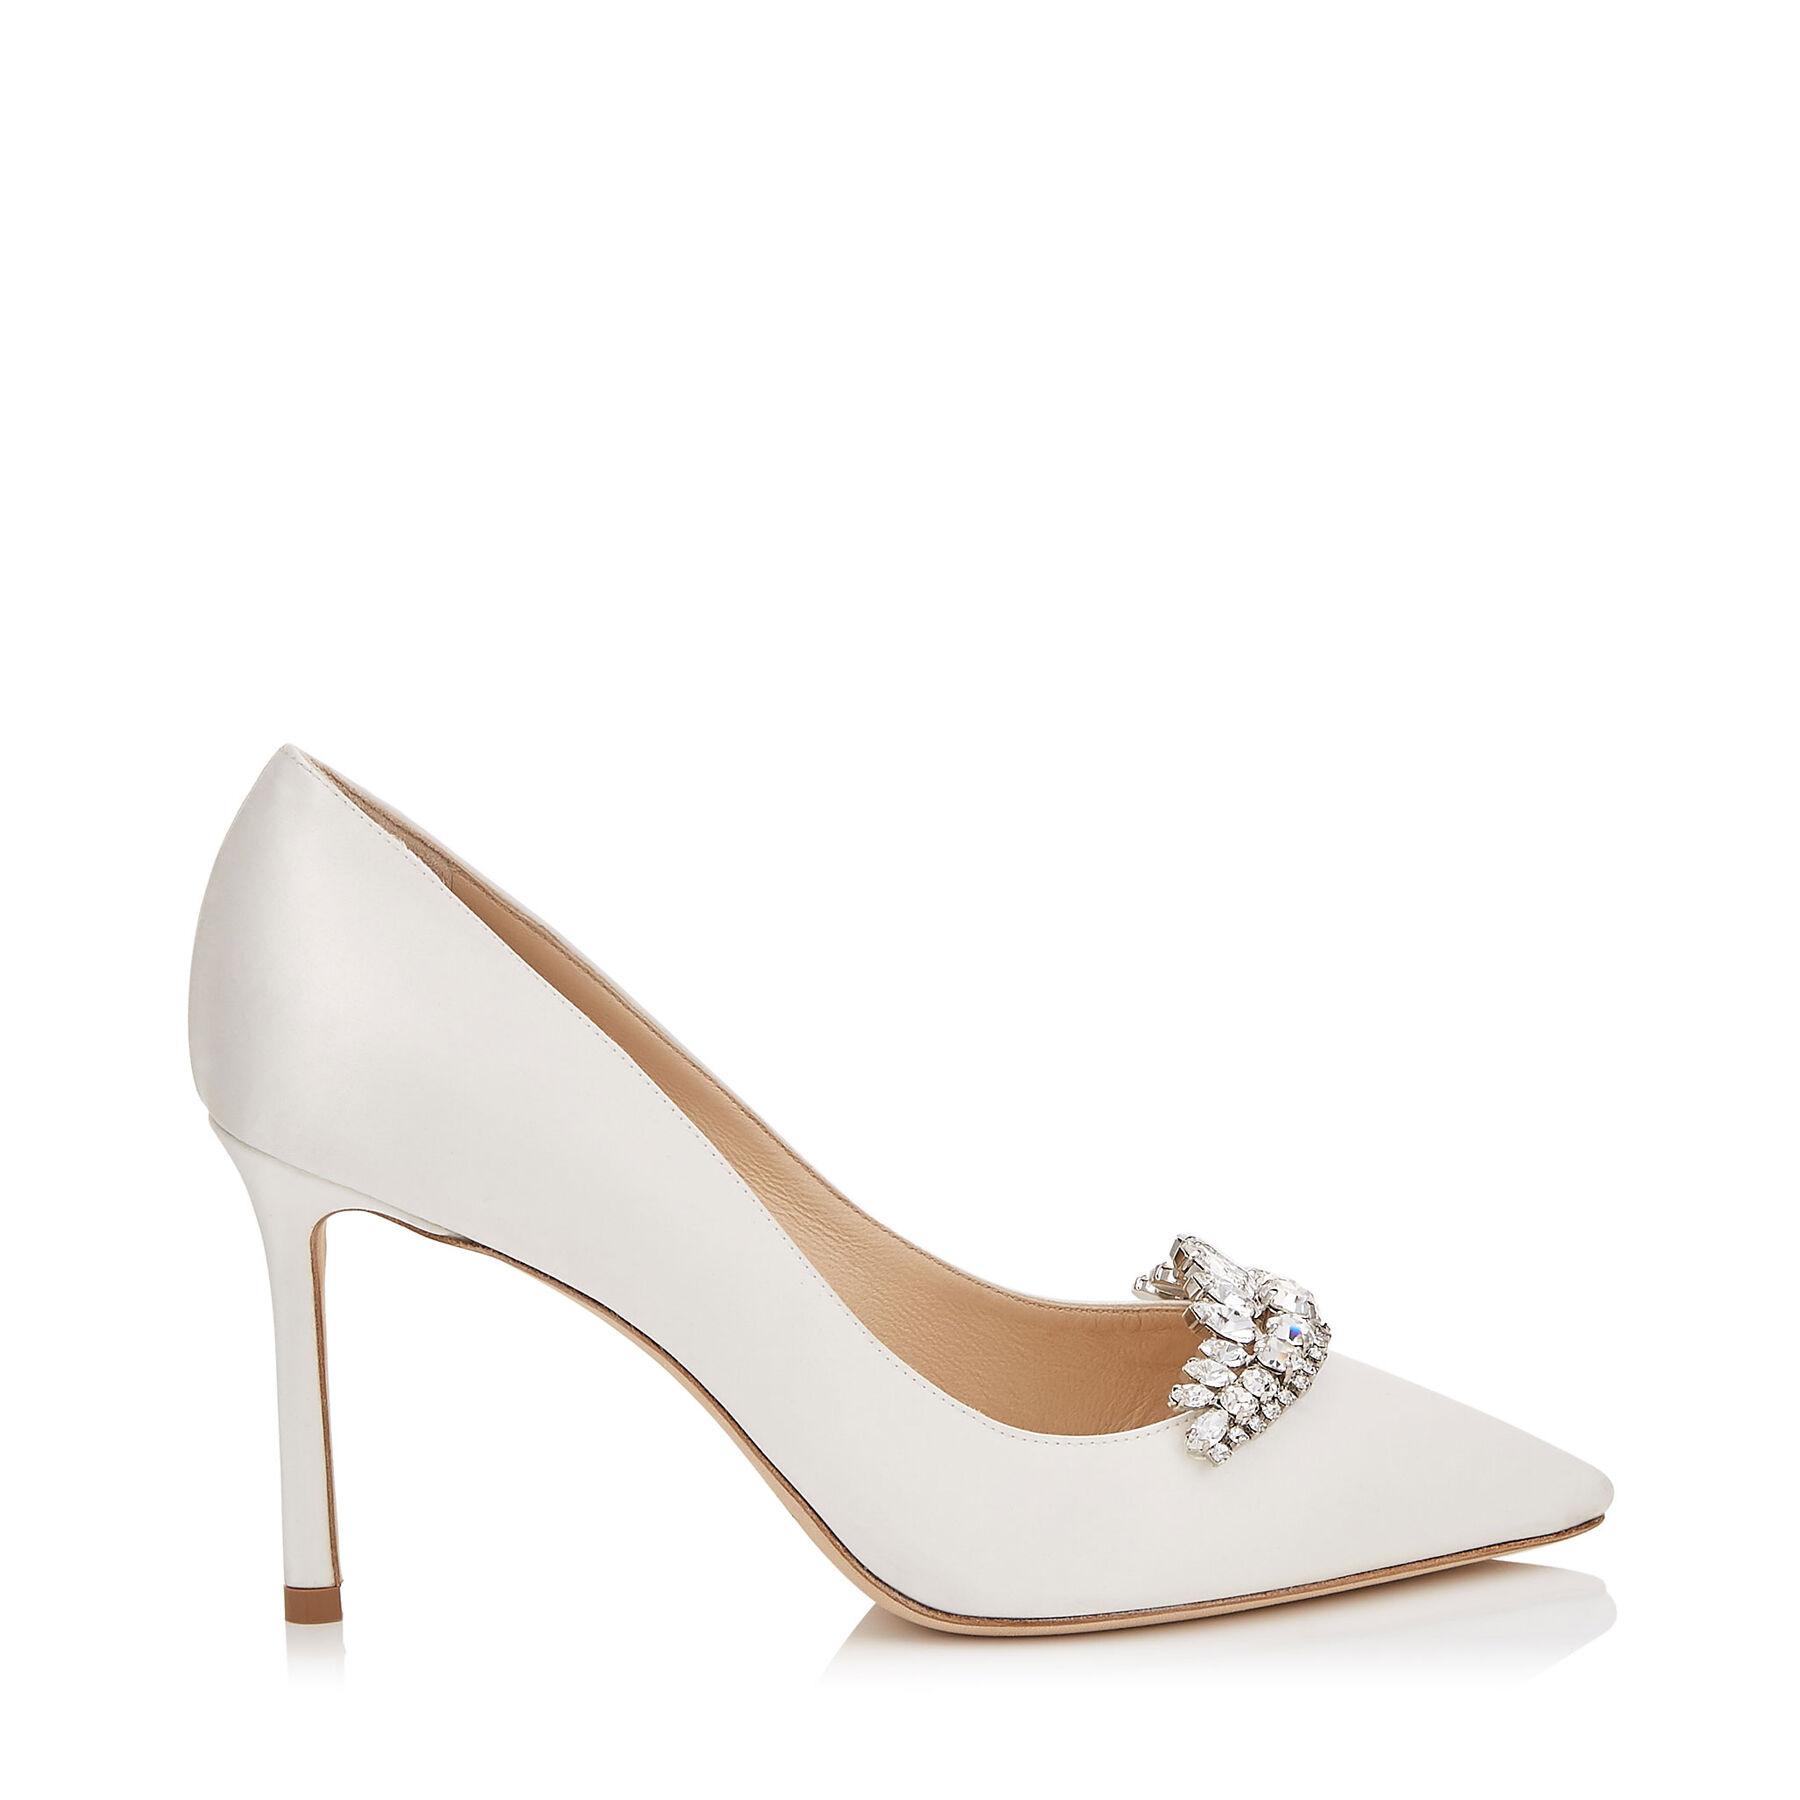 Ivory Satin Pointy Toe Pumps With Crystal Tiara Romy Bridal Jimmy Choo